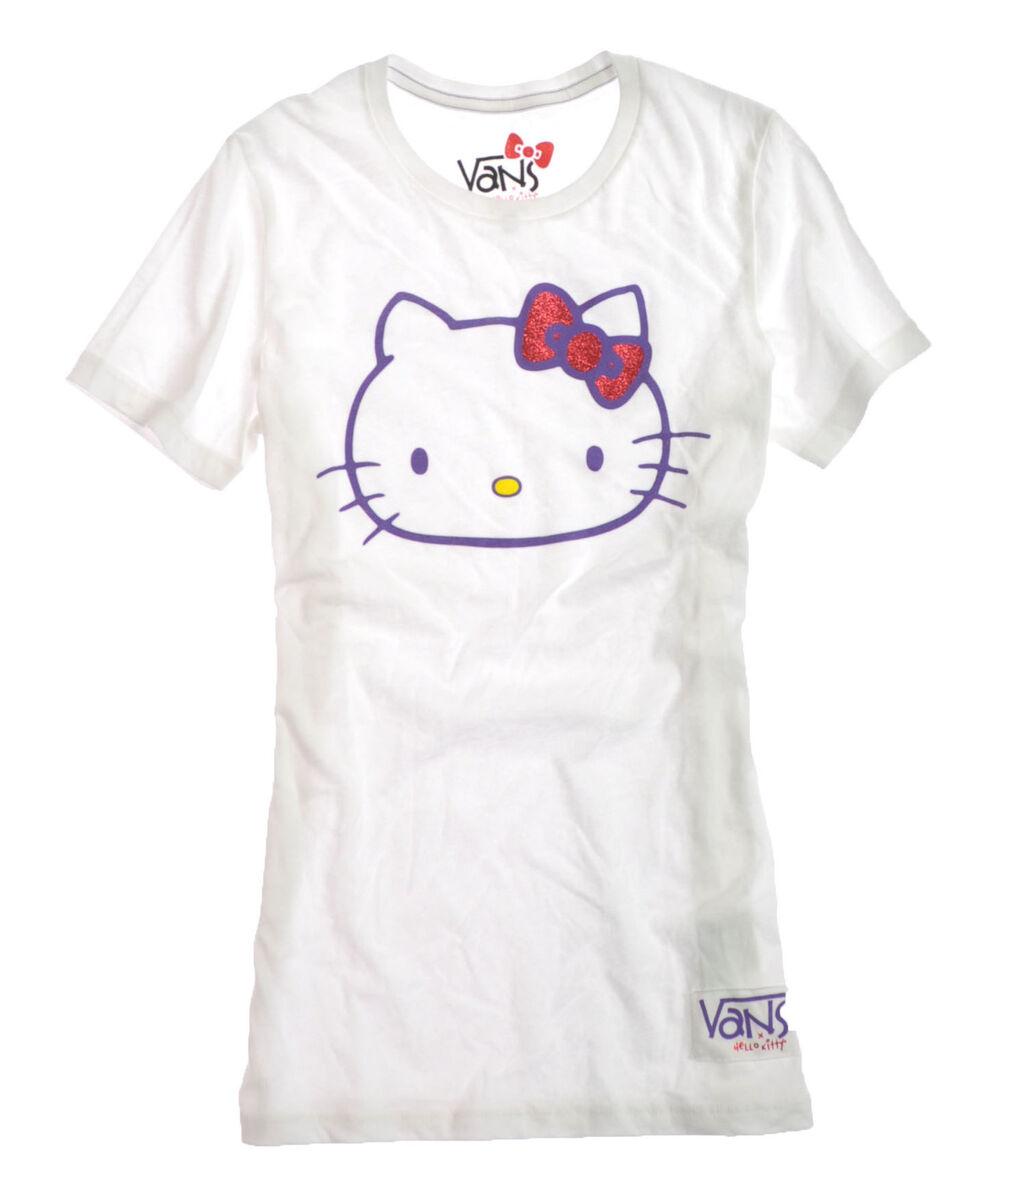 "Vans ""G Hello Kitty Passio"" Womens Crew Neck Tee T Shirt Style VN 0QXW6V5"